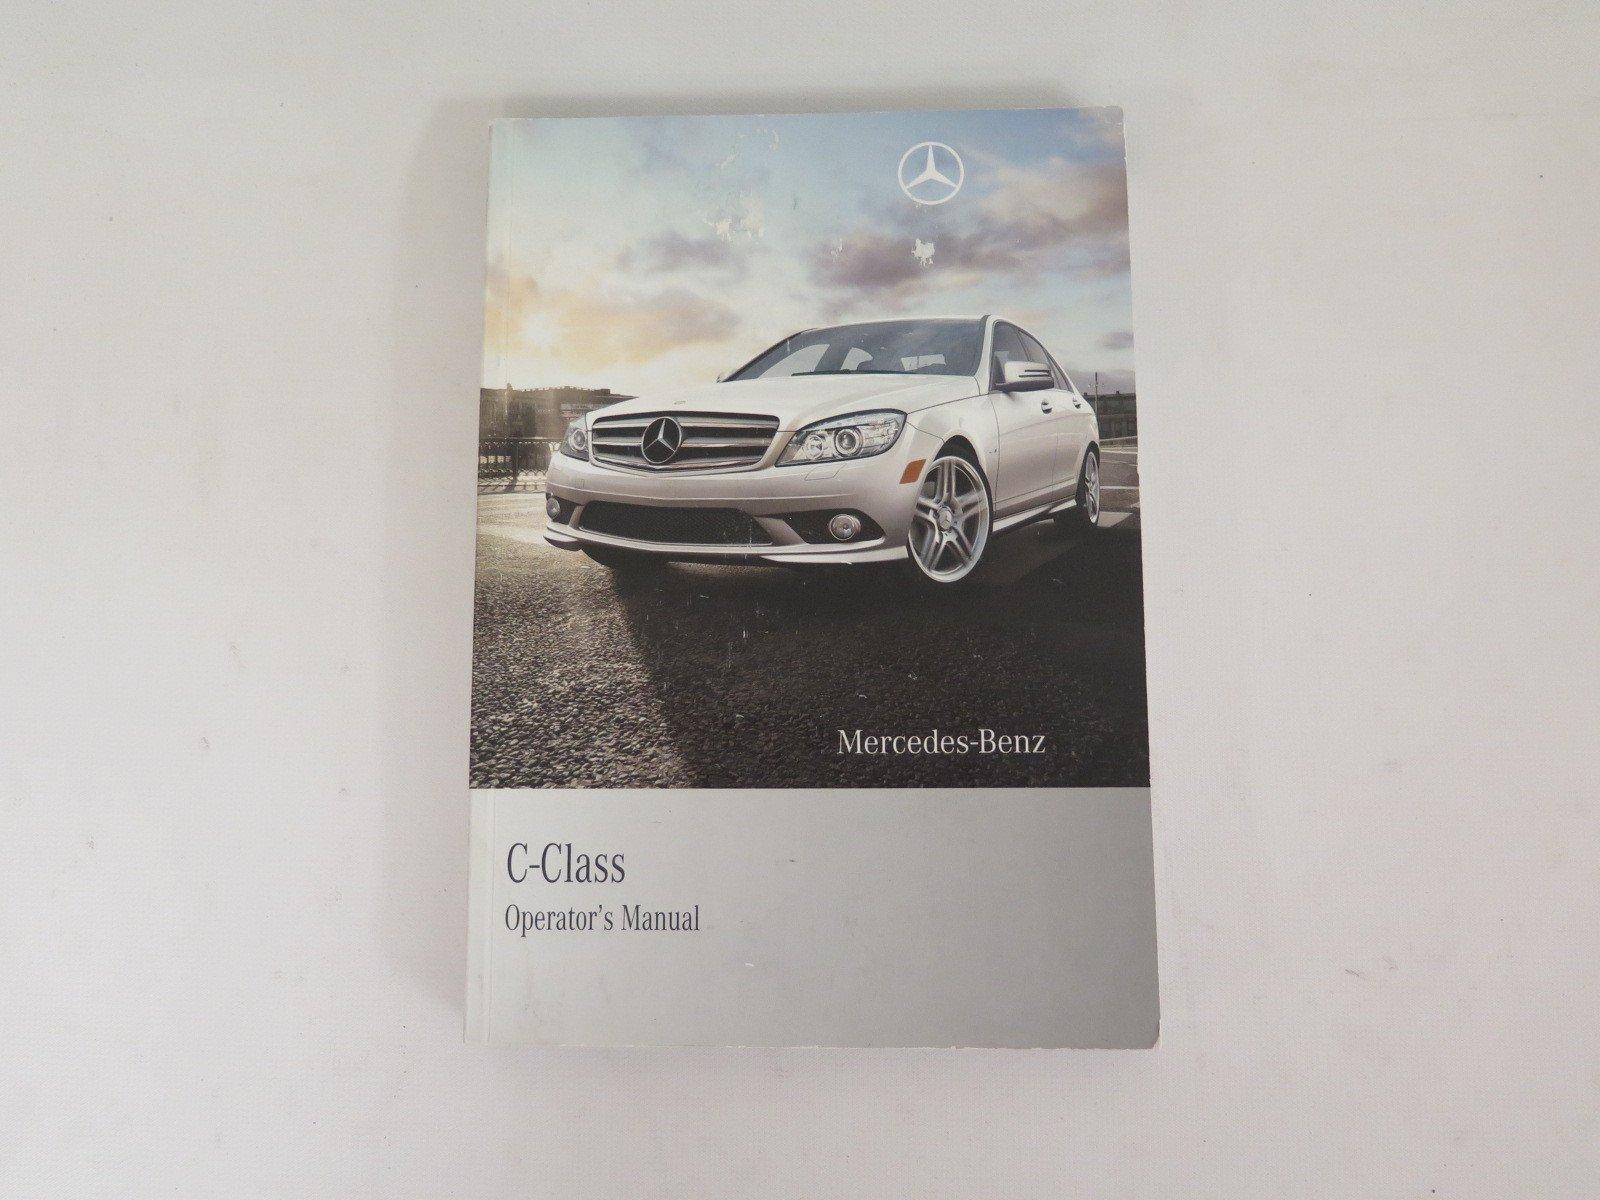 2010 mercedes benz c class owners manual with case book set rh amazon com 2011 Mercedes C-Class 2015 Mercedes C-Class